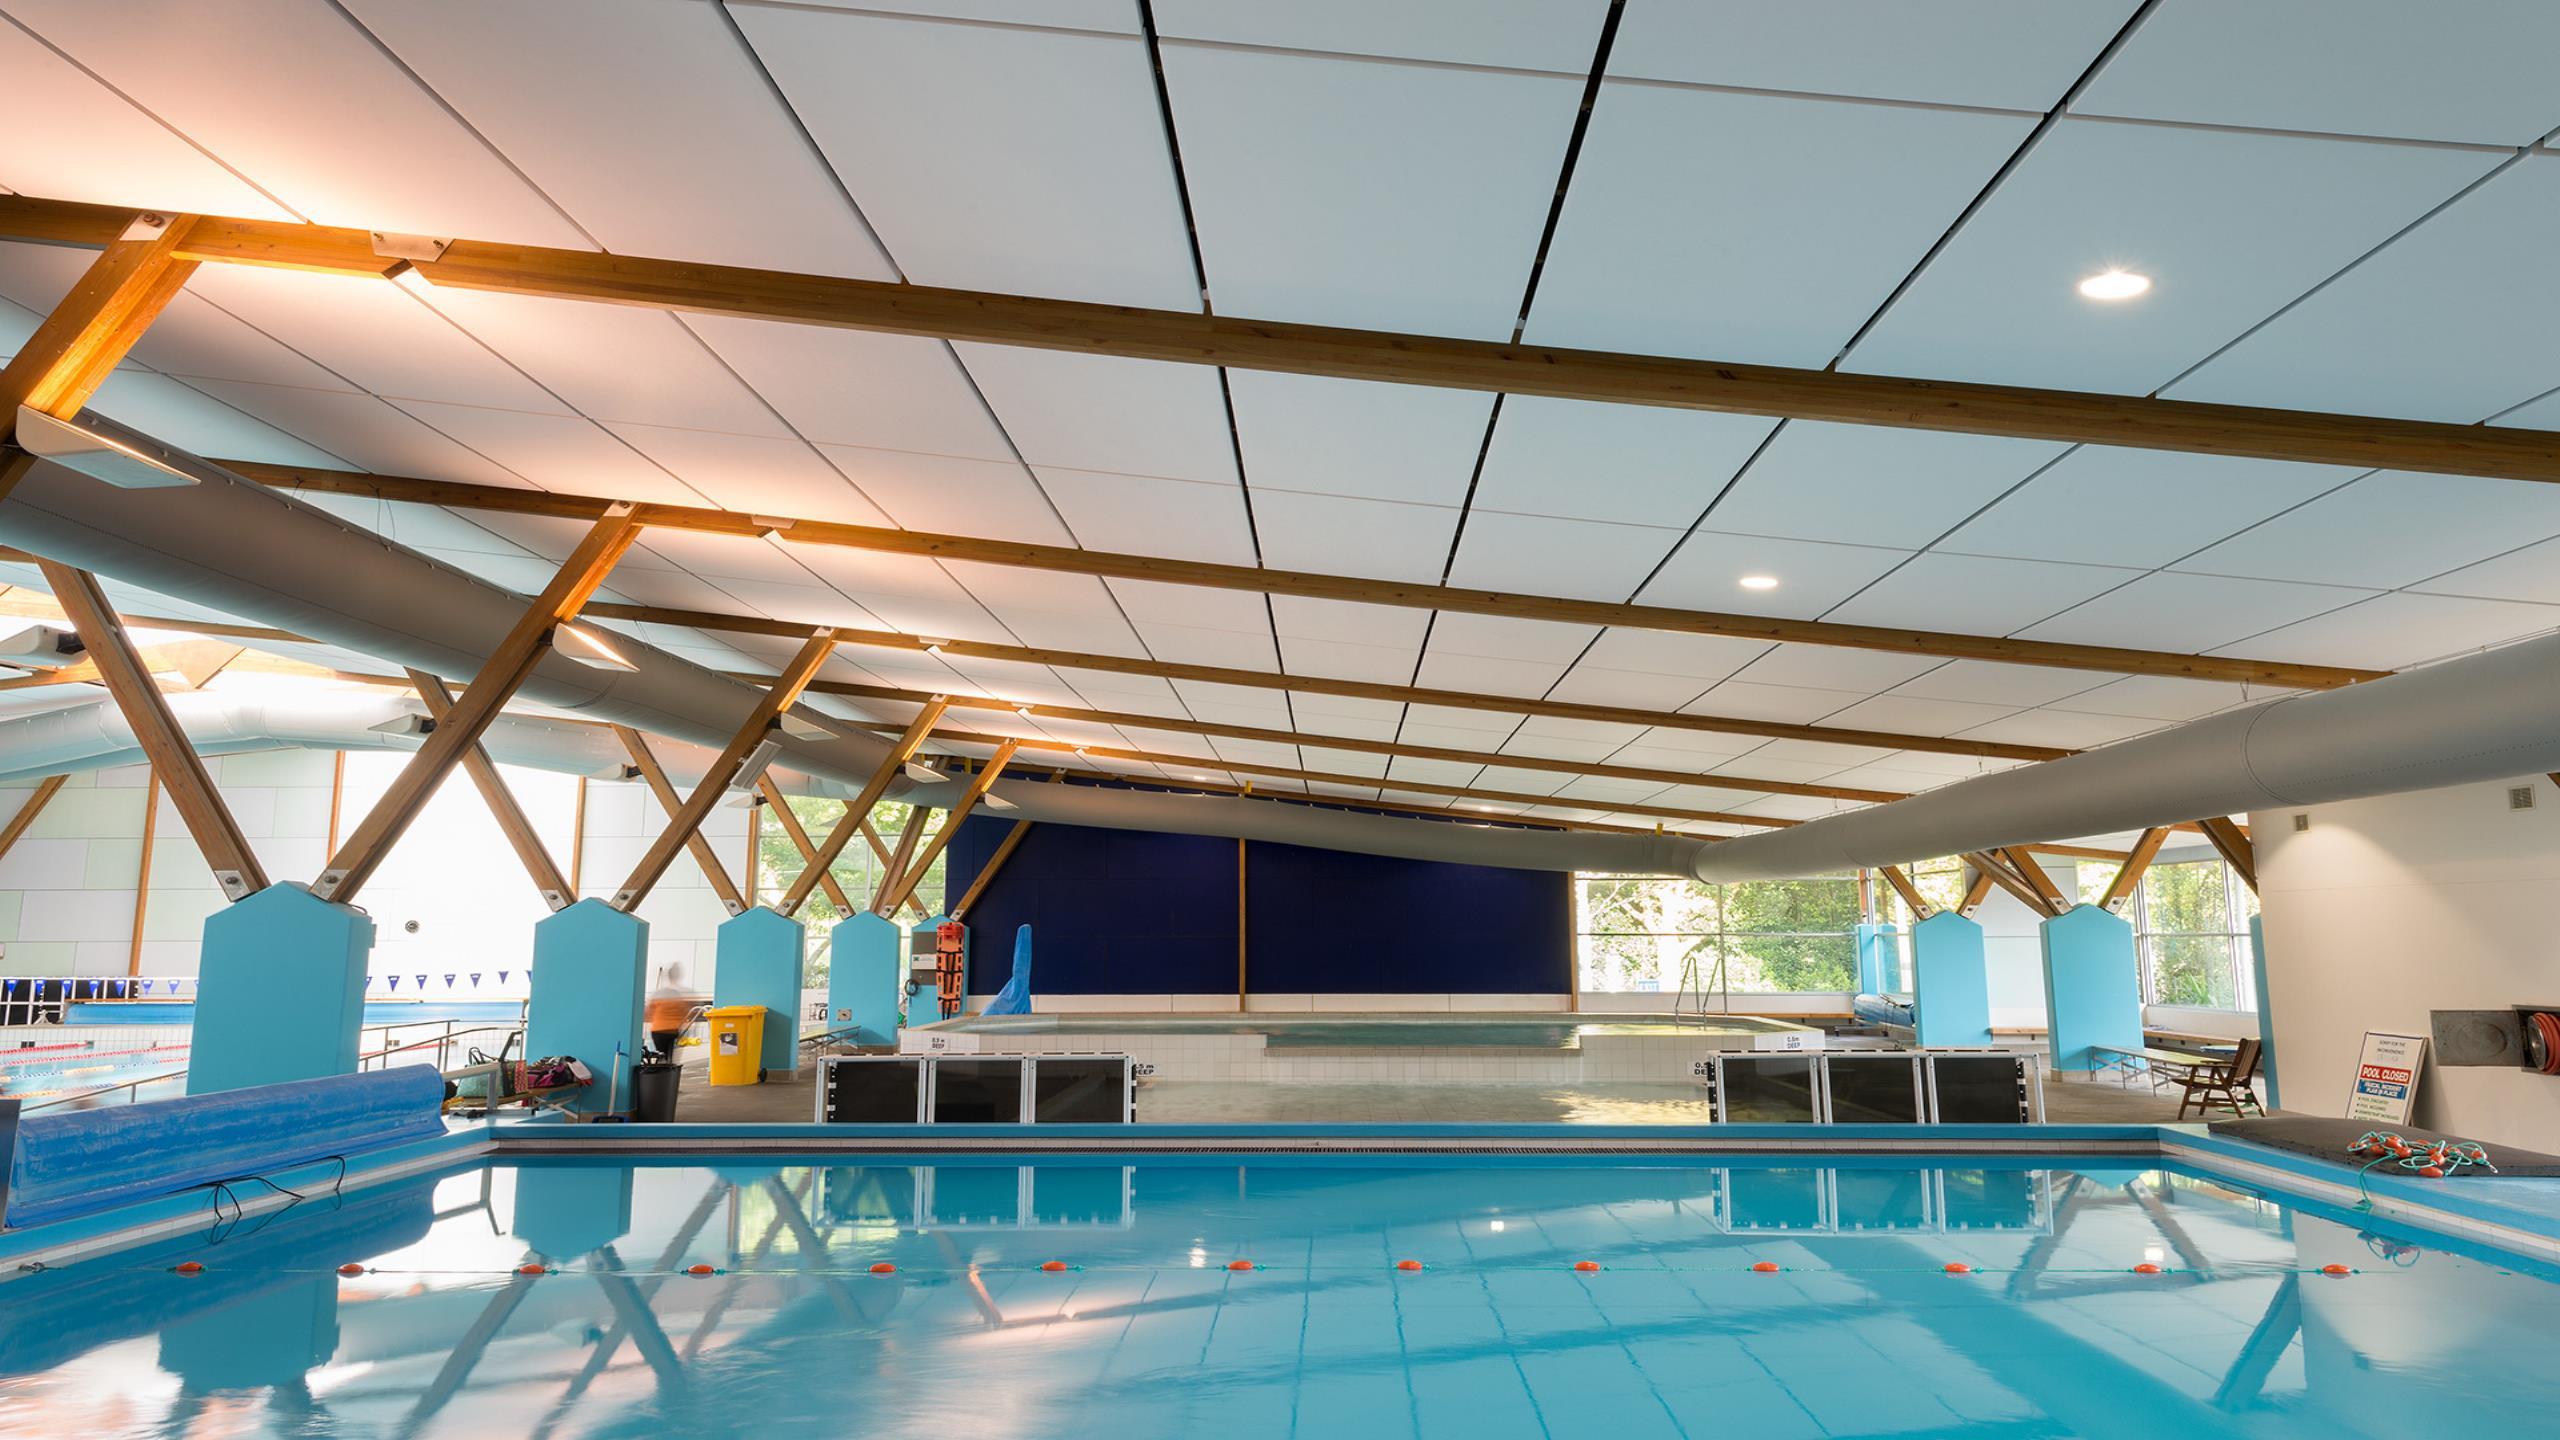 Franklin Pool - Triton Pool Panel